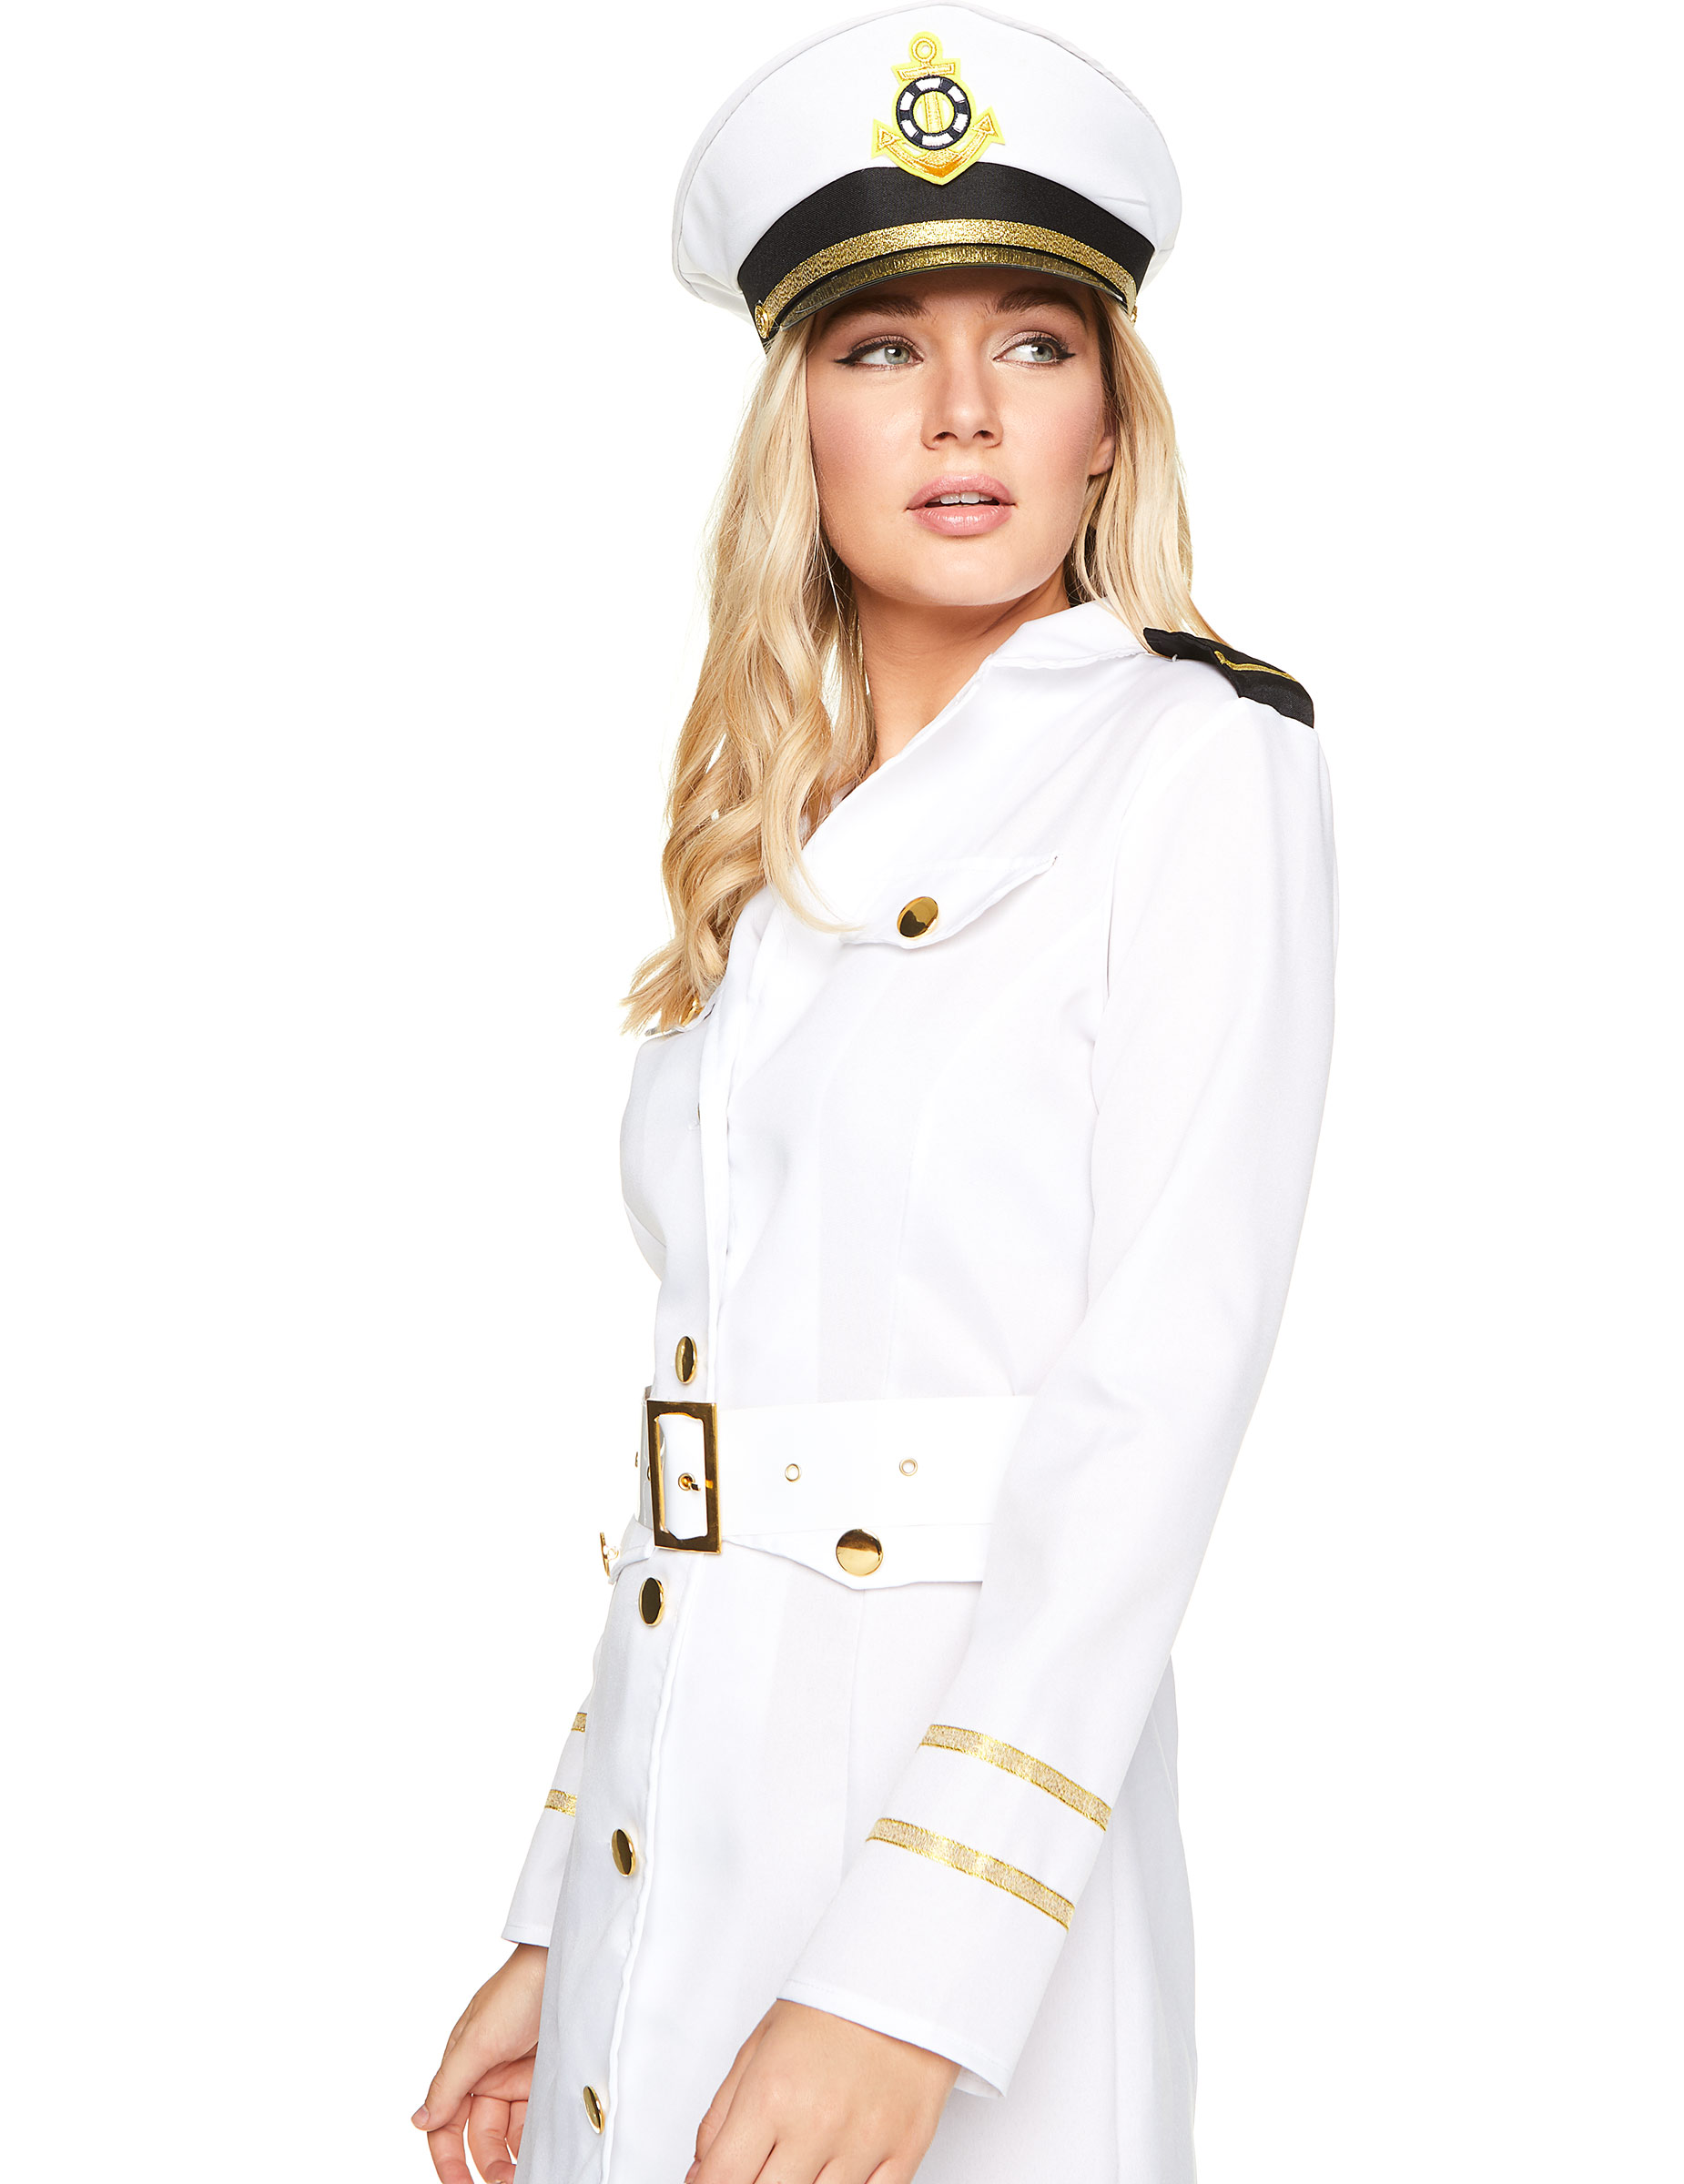 Carnavalskleding Marine Dames.Officiers Kostuum Voor Dames Vegaoo Nl